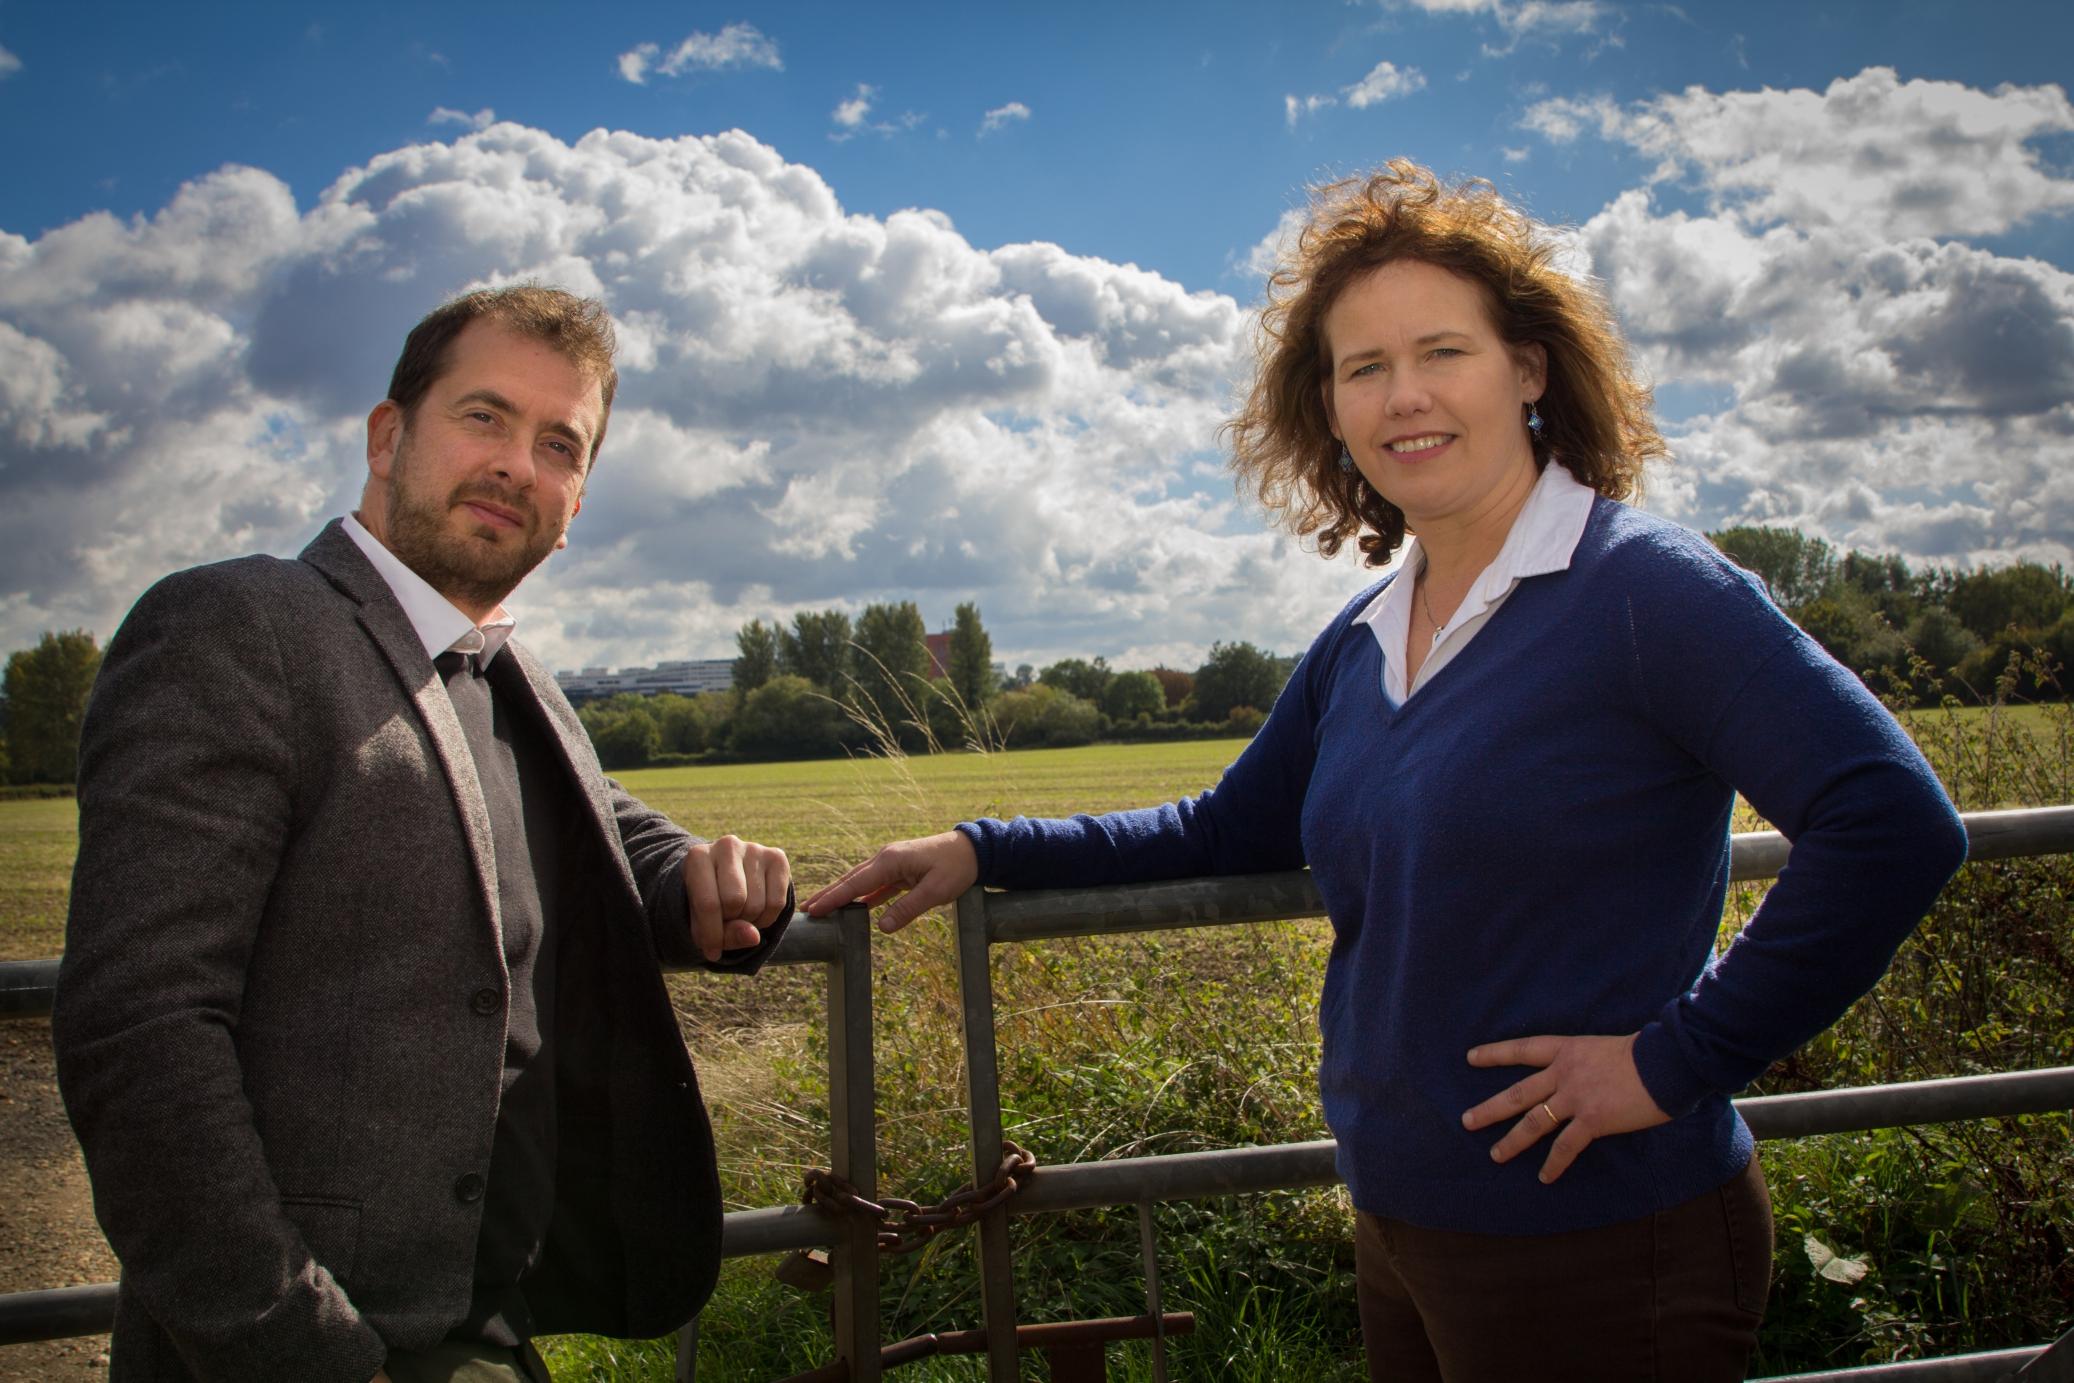 Kirsten Johnson Steps Down as Wheatley Councillor, Tim Bearder Selected